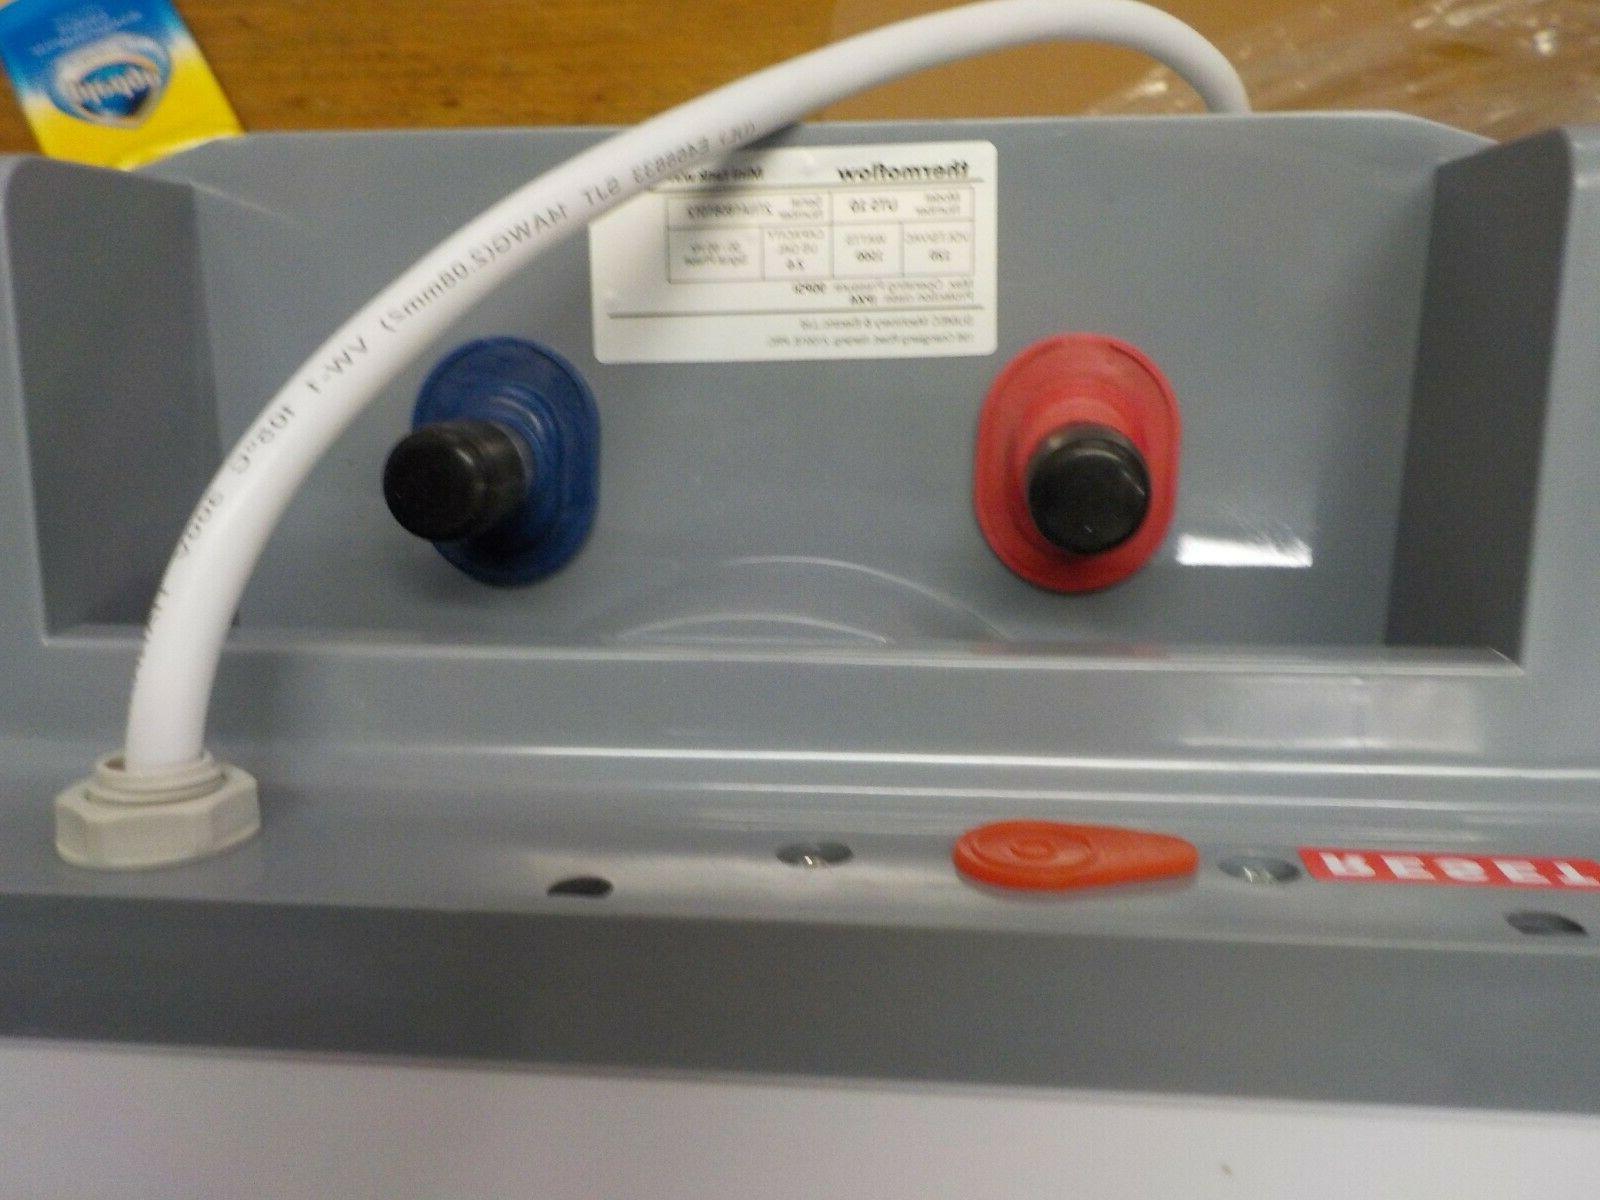 Thermoflow UT10 Electric Mini-Tank Water at